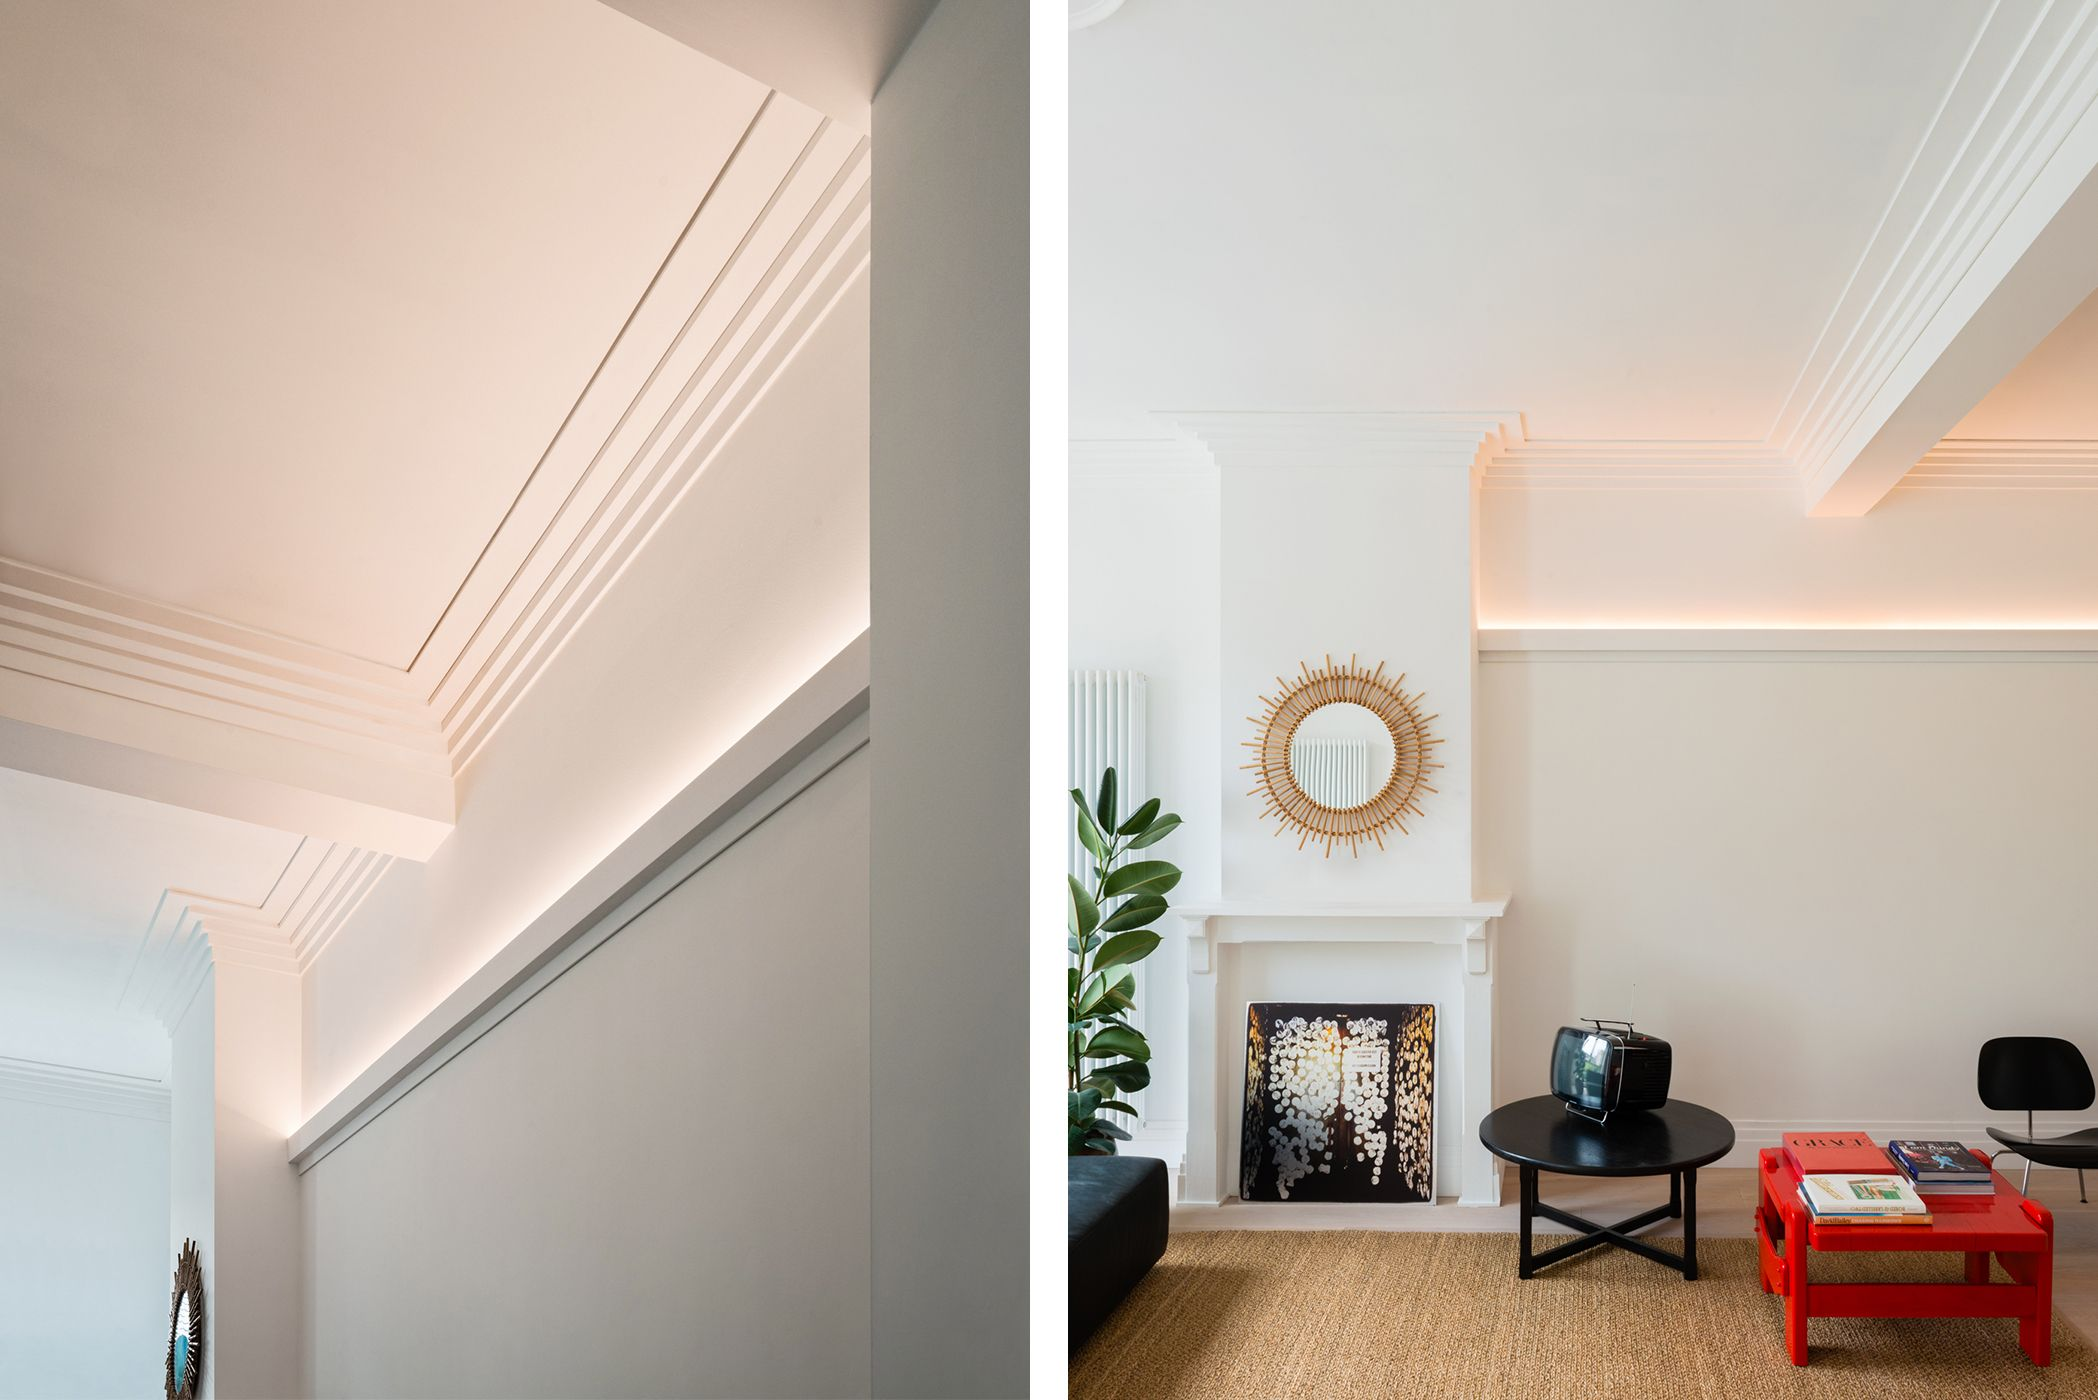 The Uplighting Coving Shop Wm Boyle Interiors